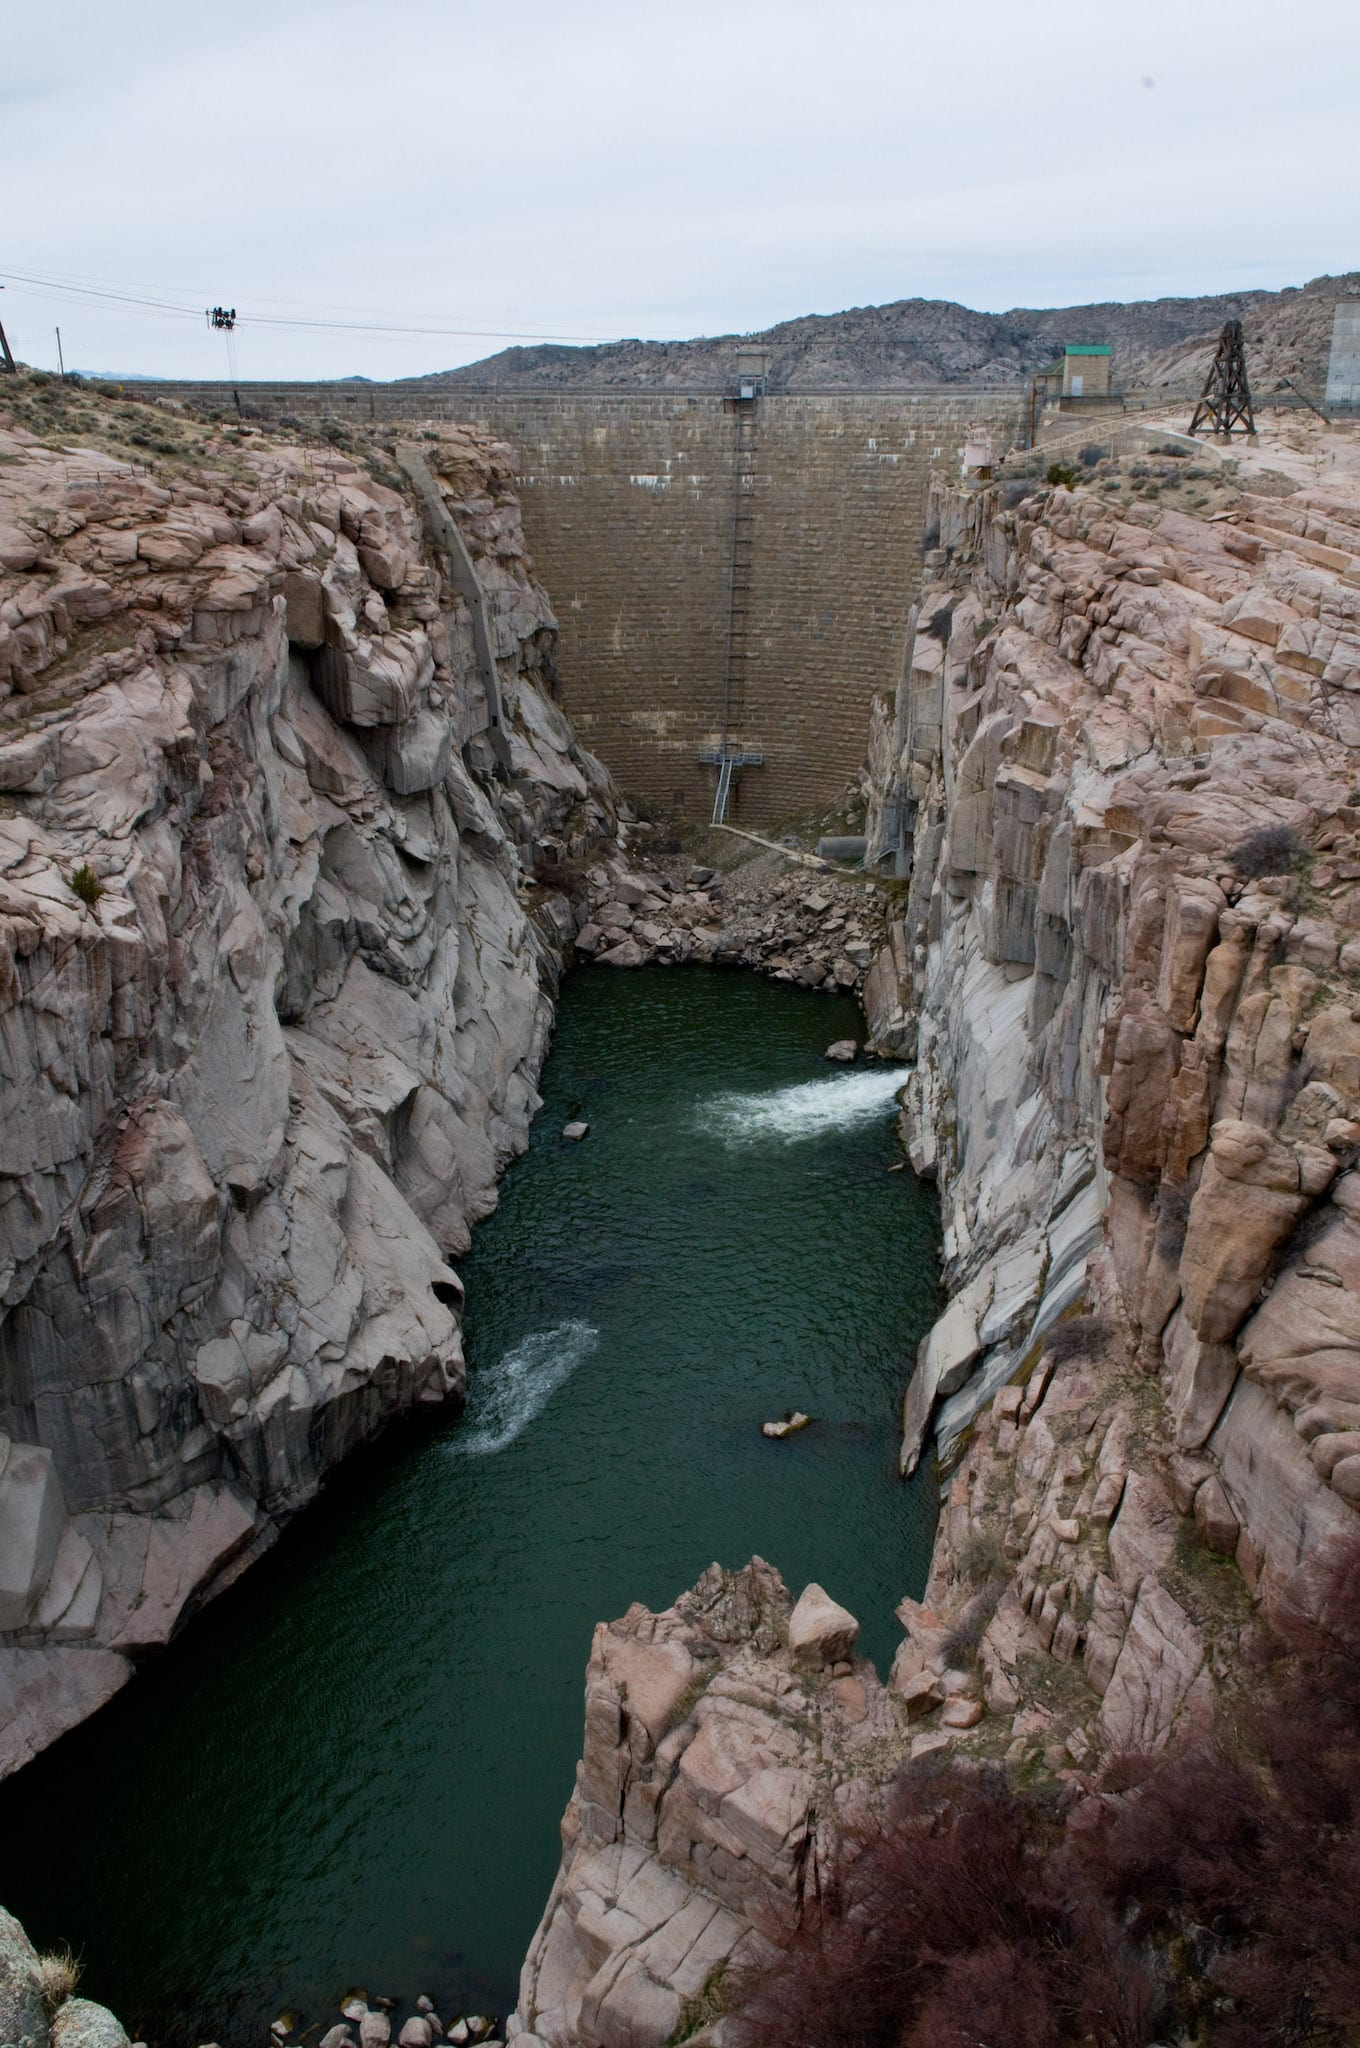 Pathfinder Dam North Platte River Wyoming